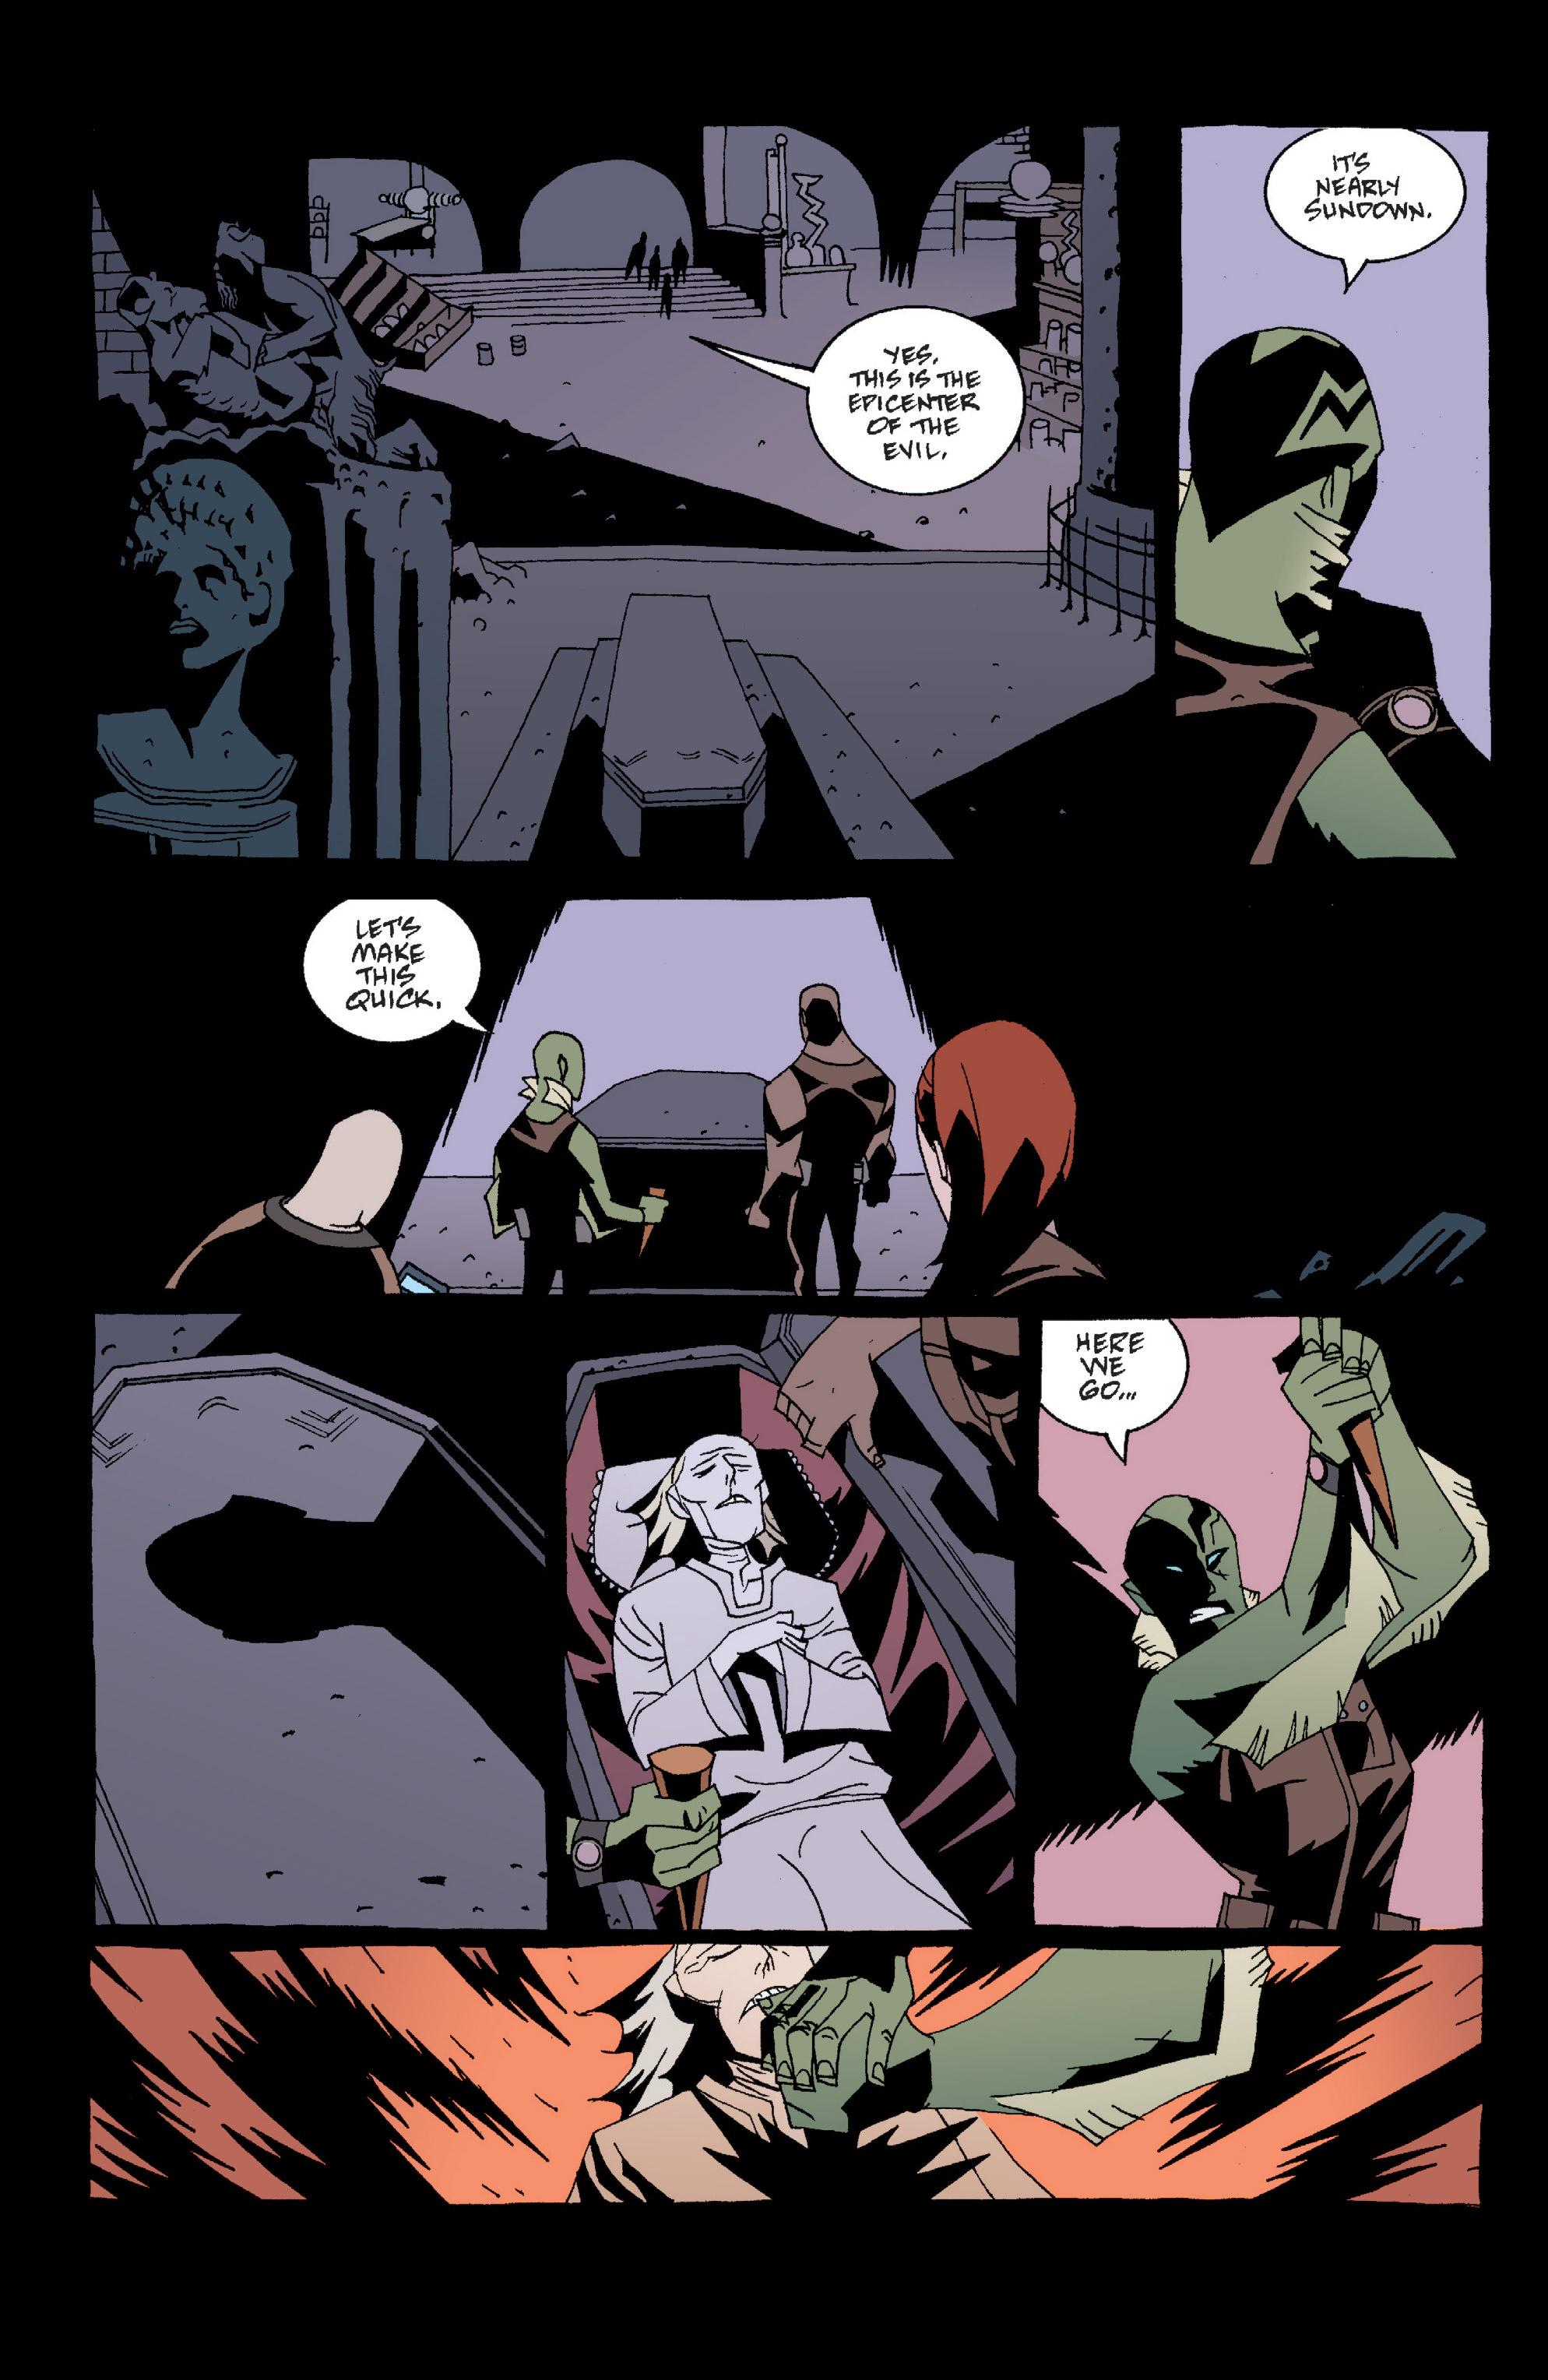 Read online B.P.R.D. (2003) comic -  Issue # TPB 2 - 18